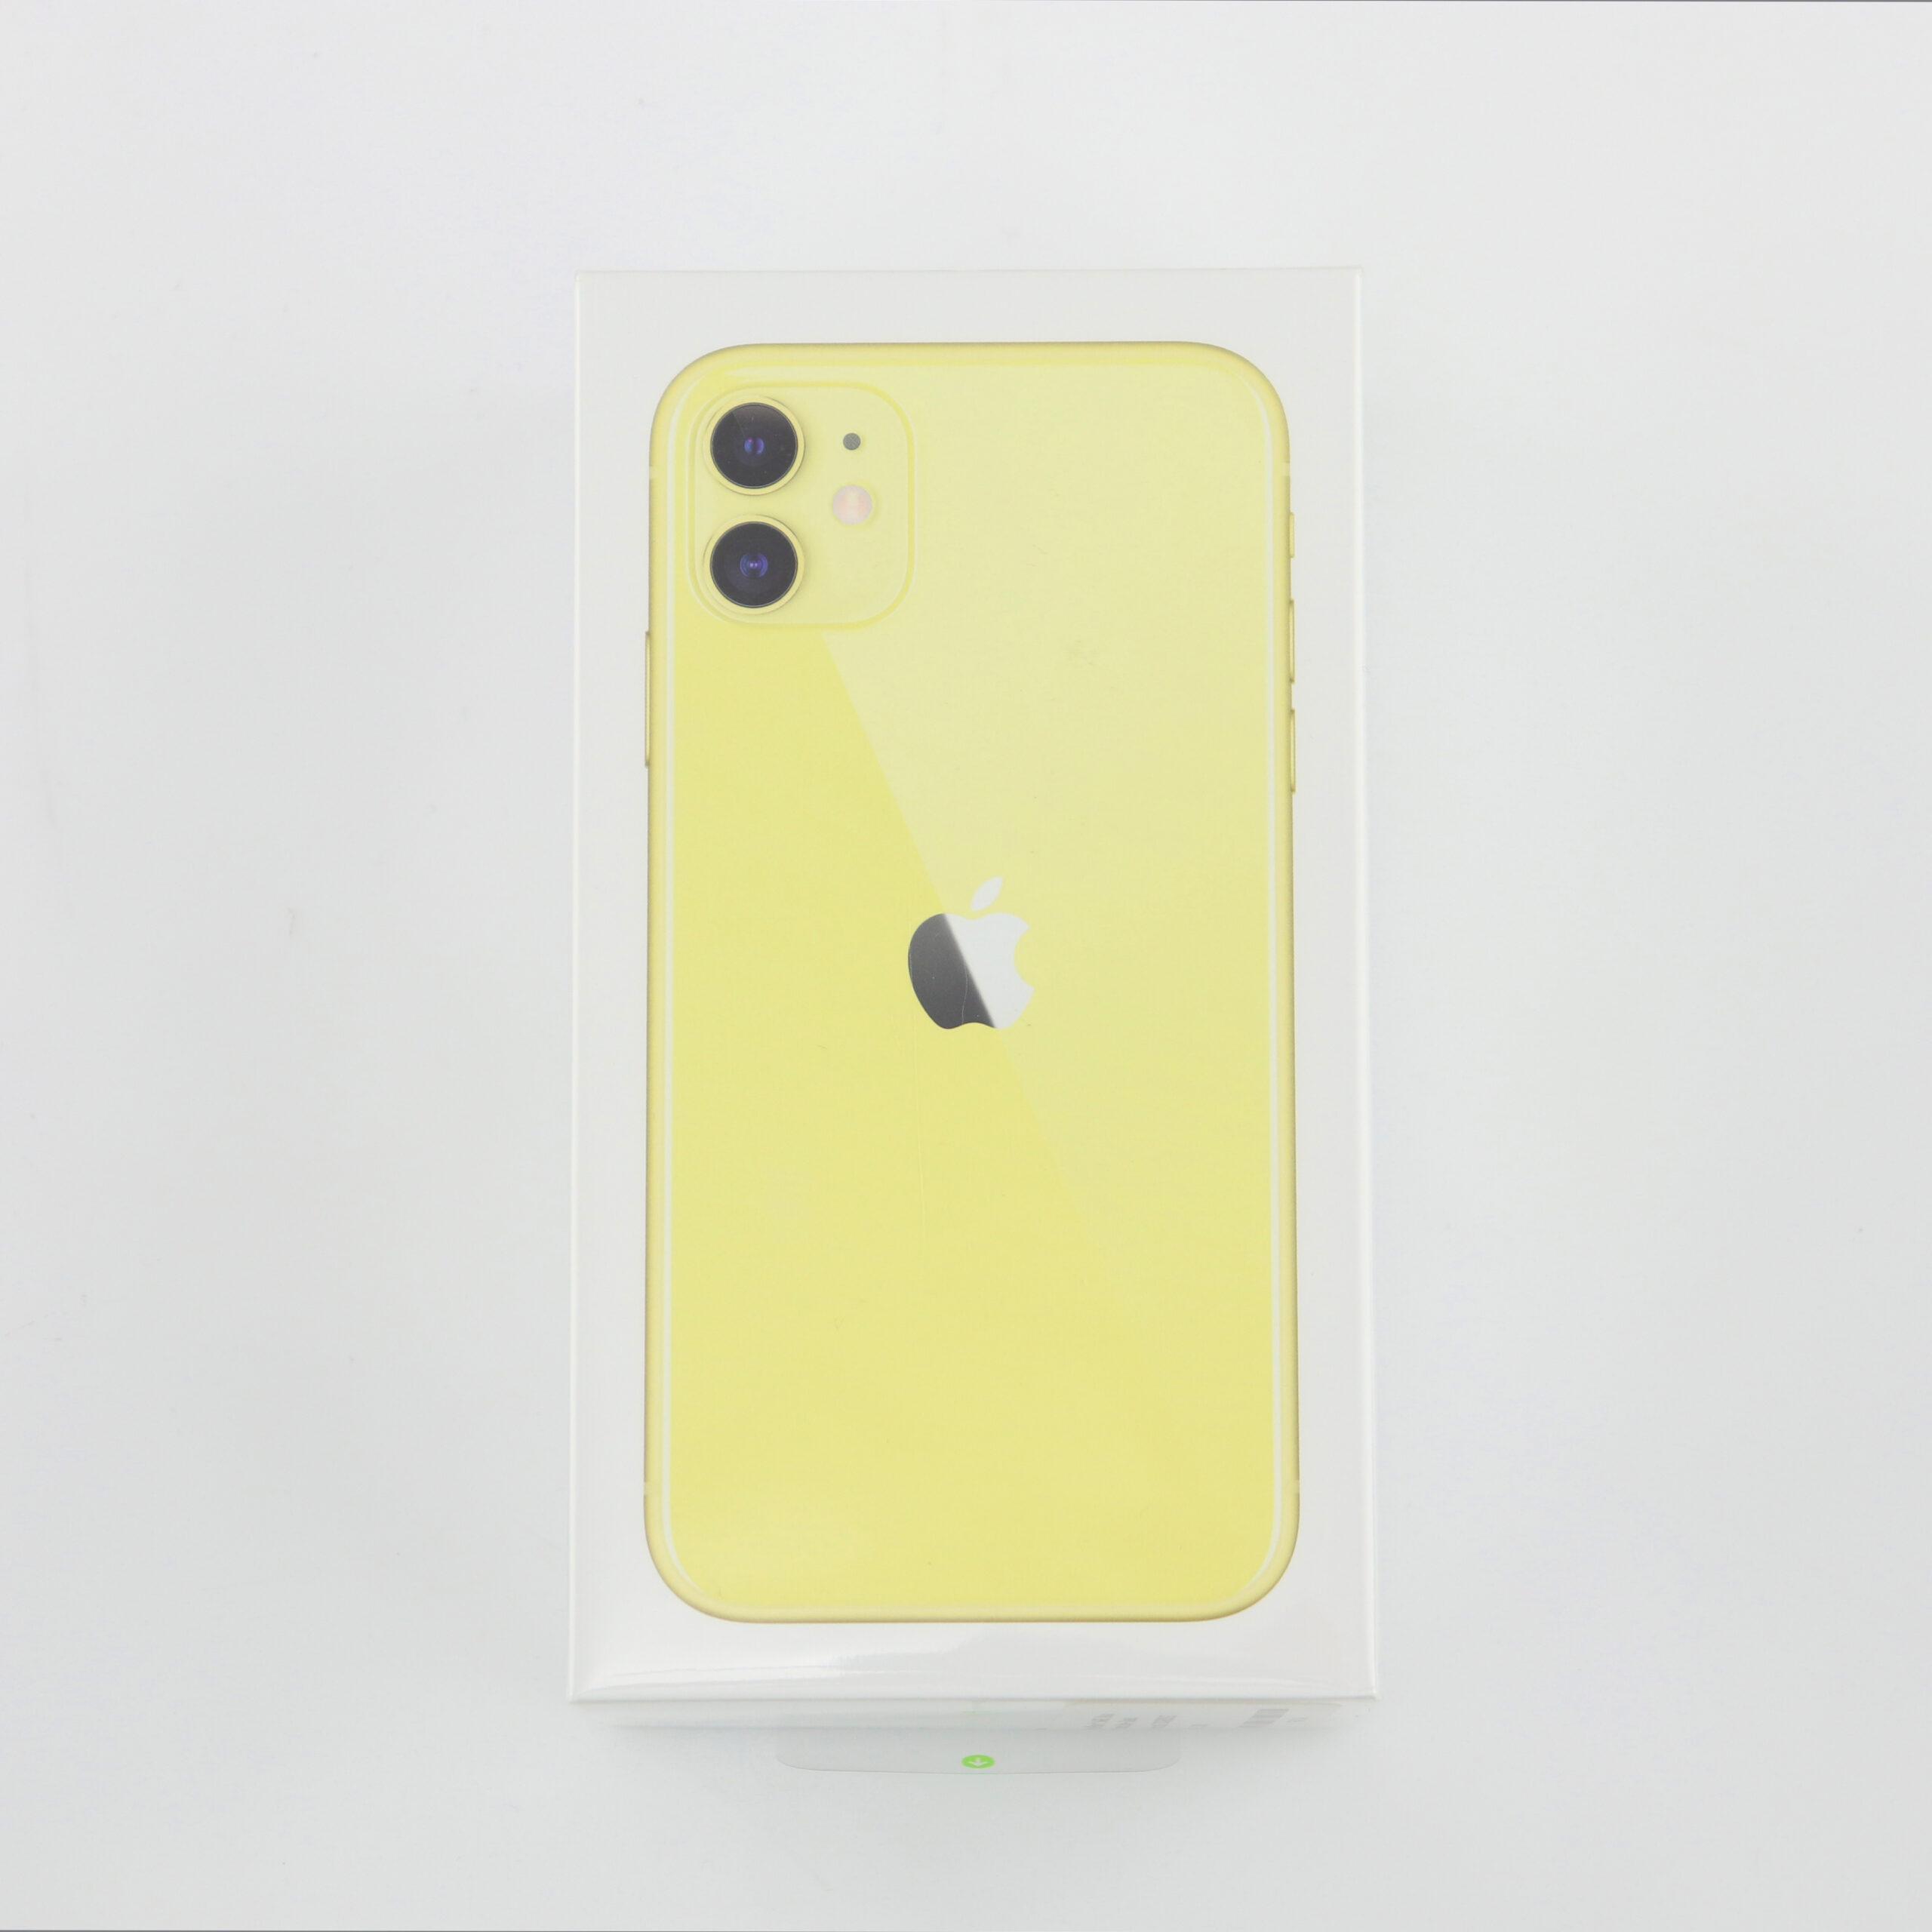 1 x Apple iPhone 11 (Unlocked) 64GB Yellow (BRAND NEW)